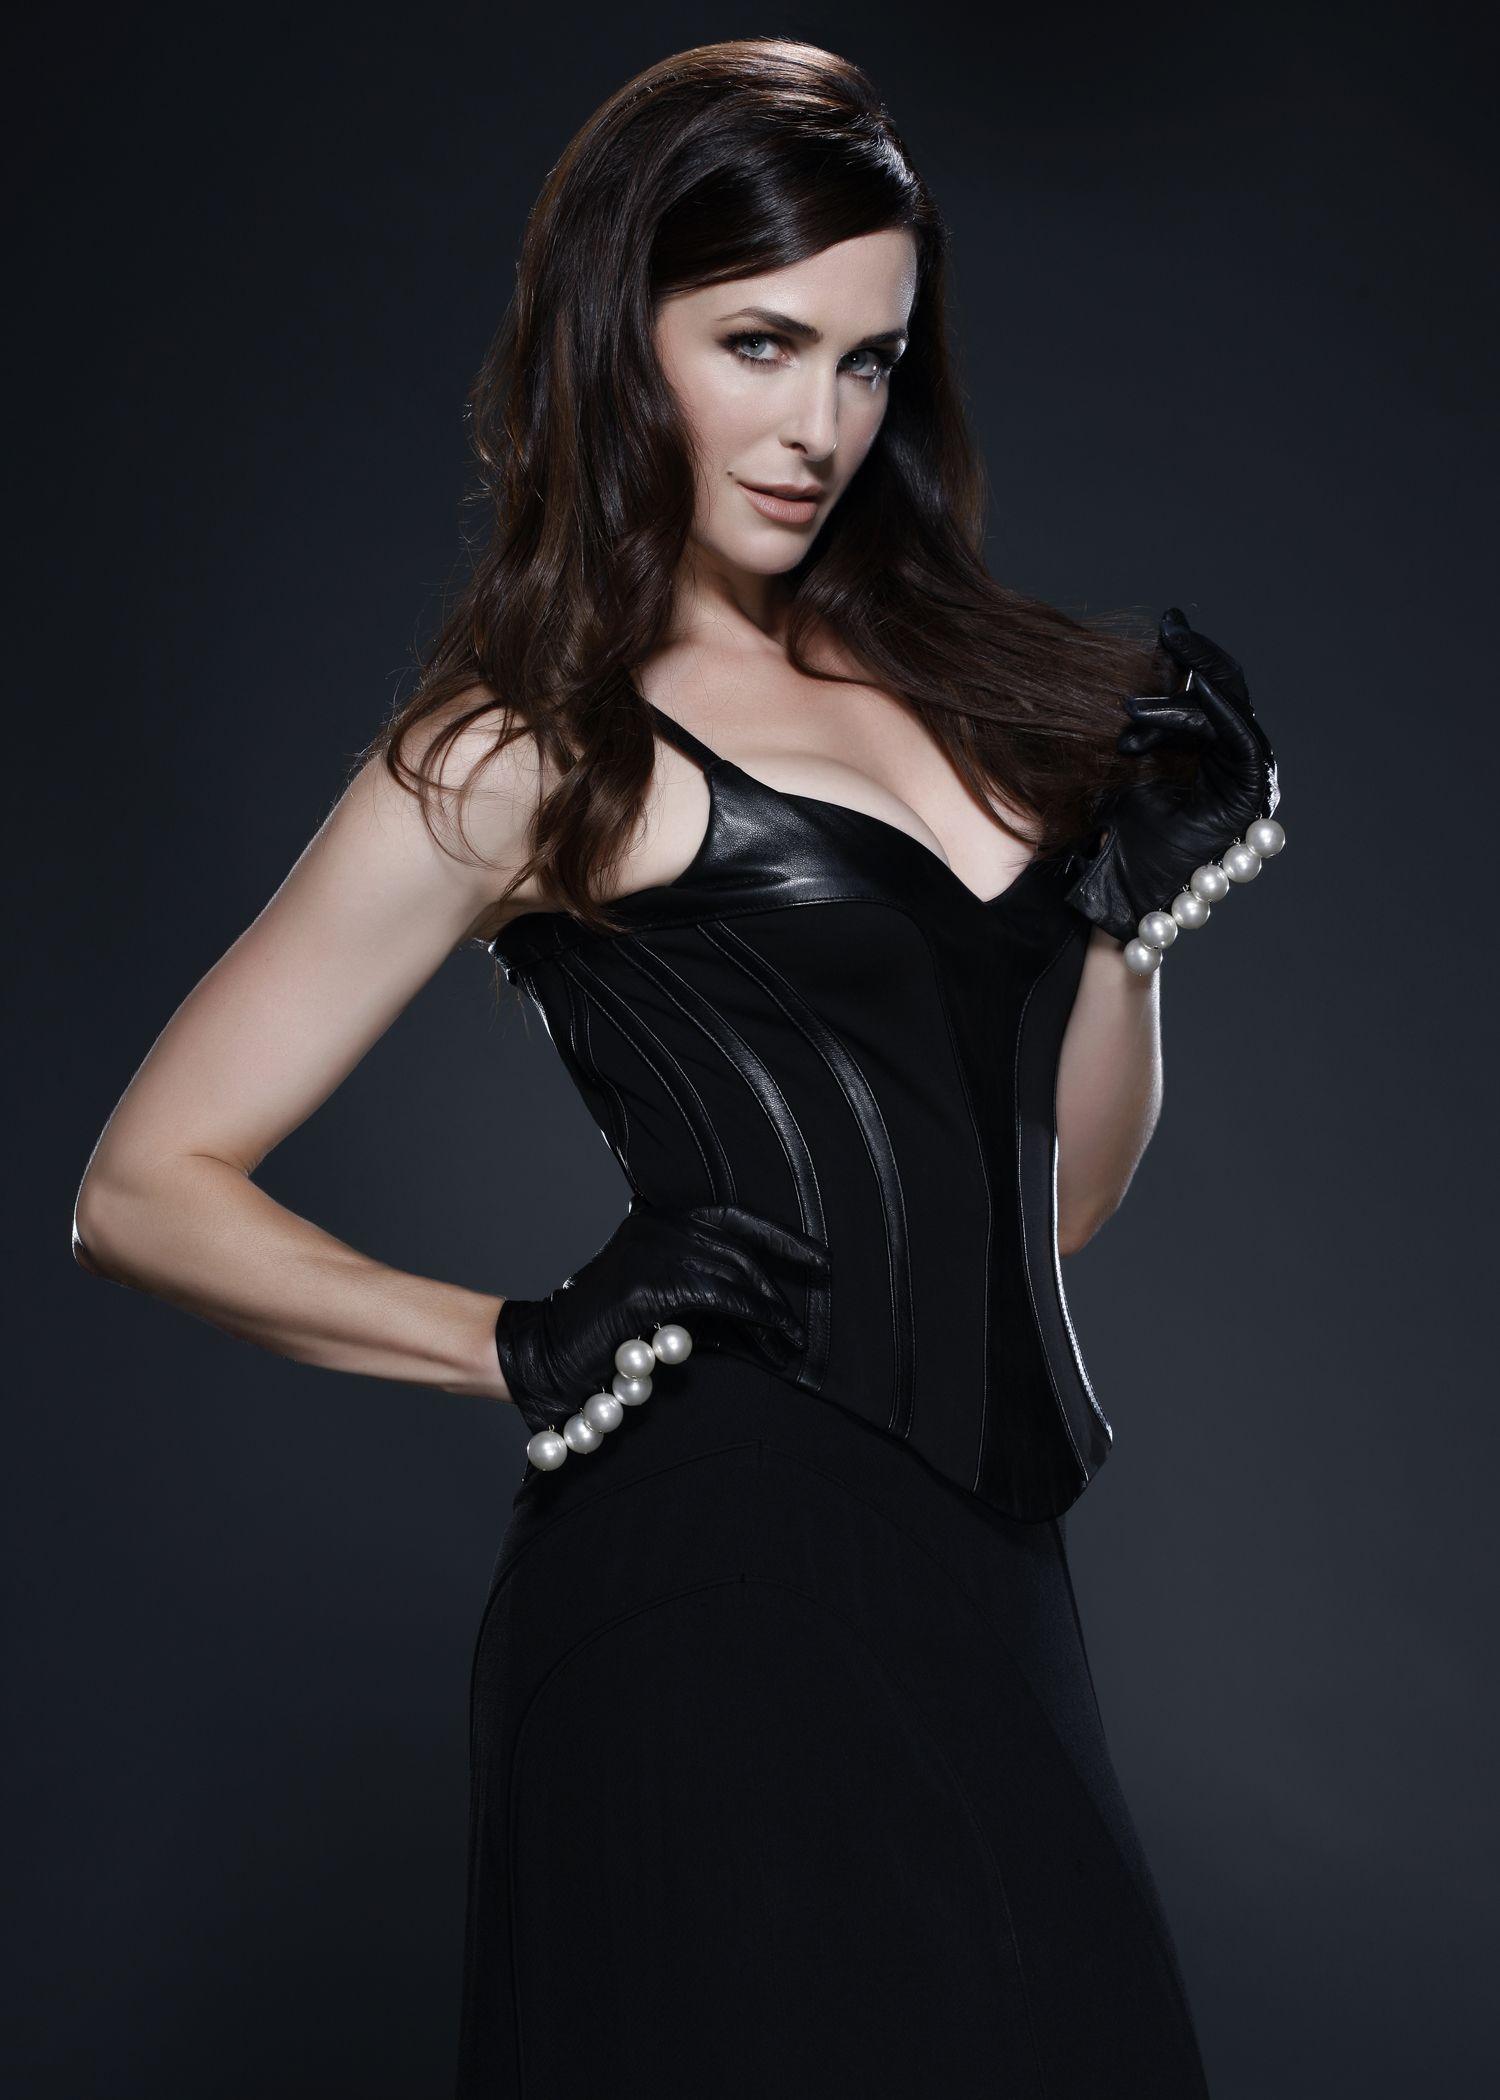 Danielle Bisutti Porno Videoer